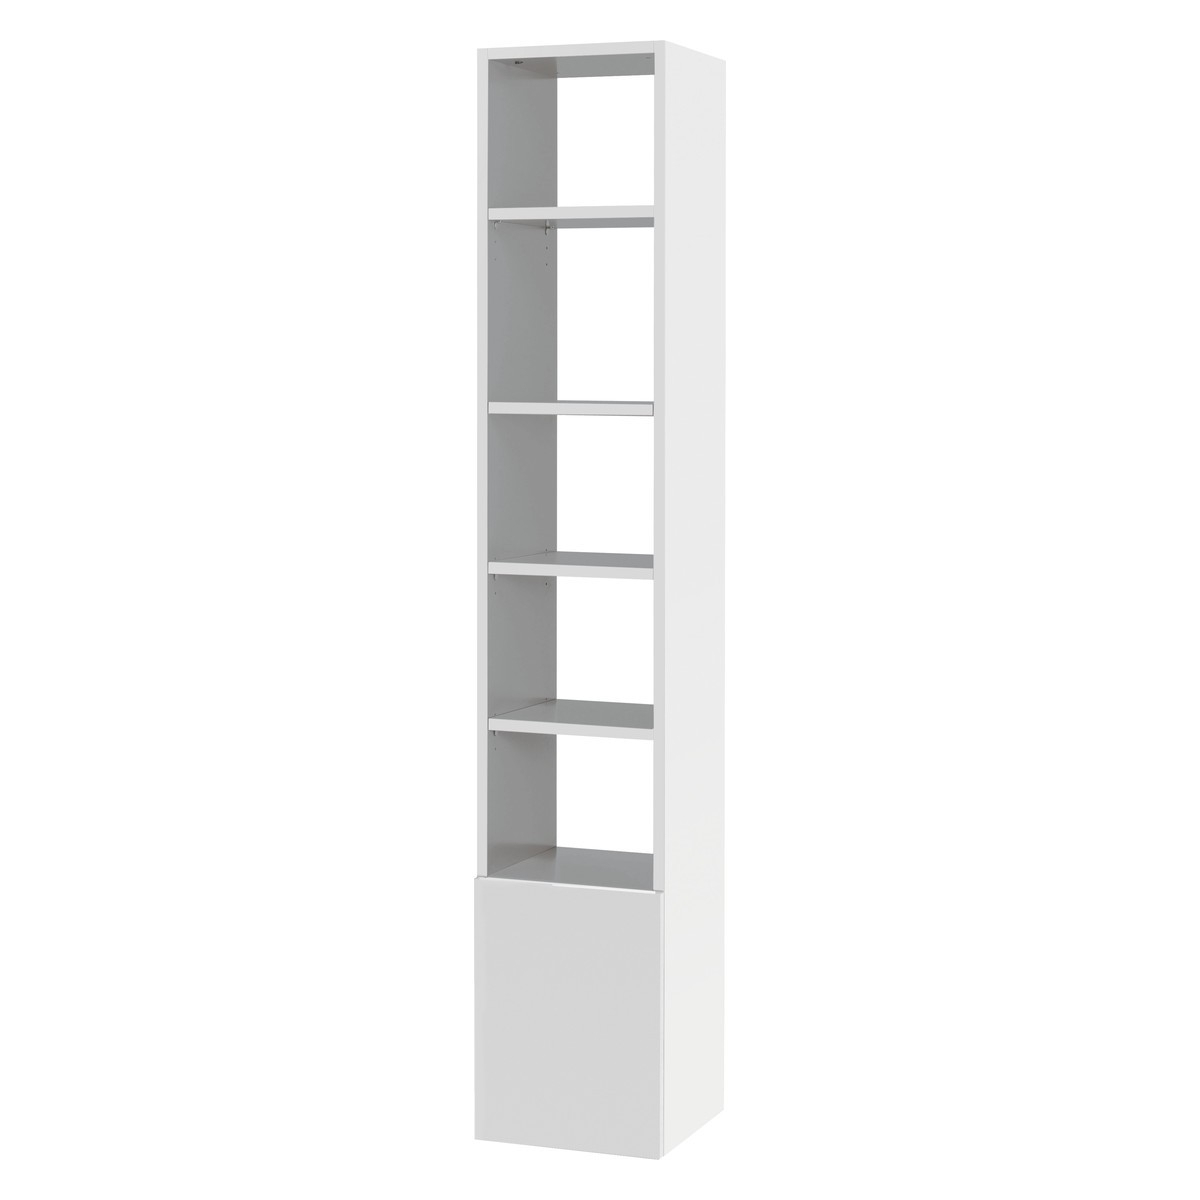 Kubrik White High Gloss Tall Shelving Unit (View 4 of 15)